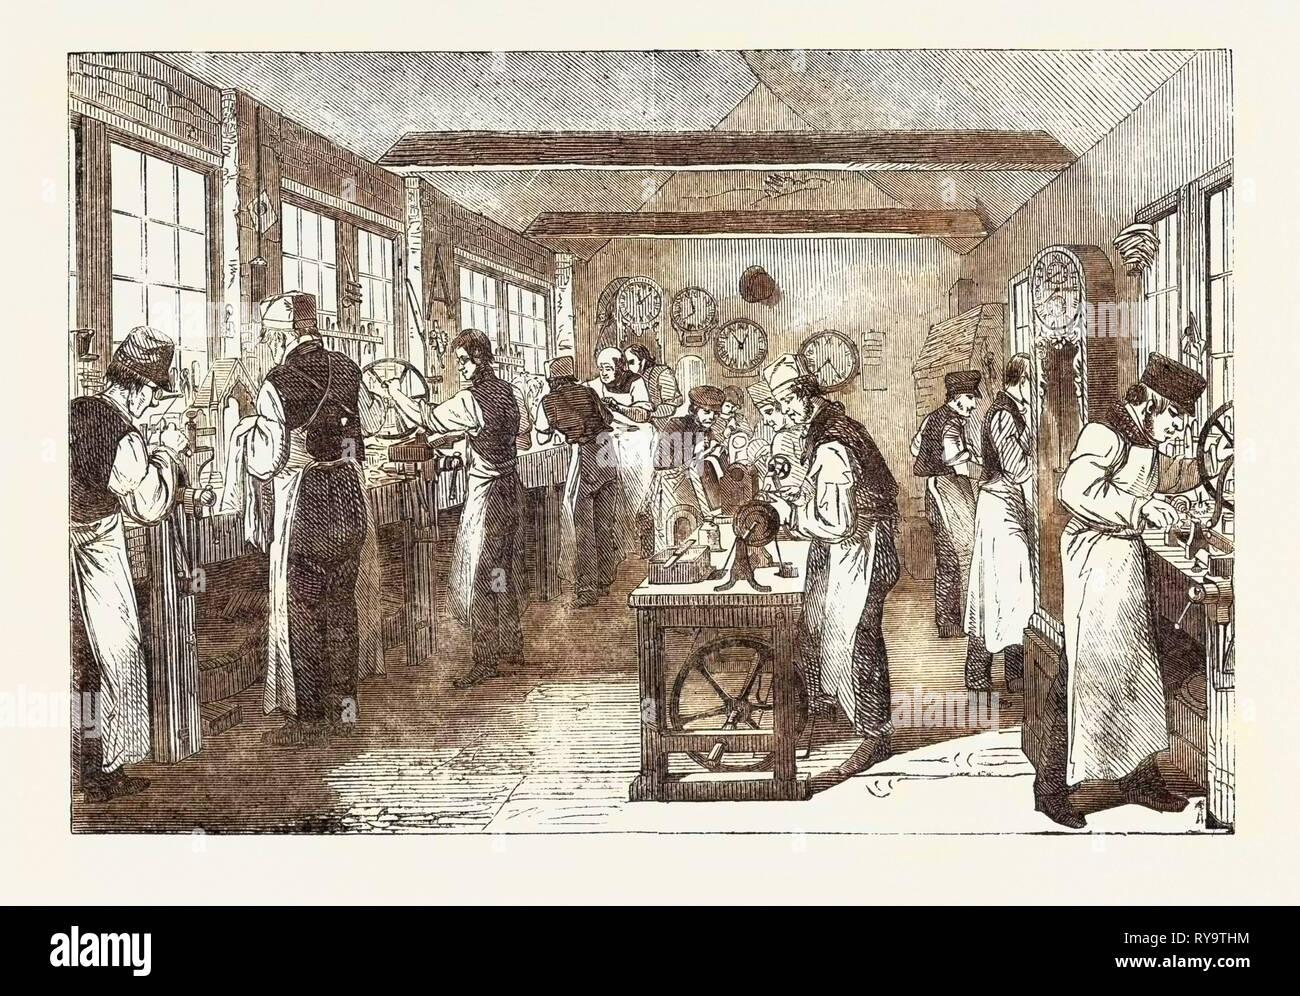 Clerkenwell Clock Factory: The Regulator and General Clock Shop, UK - Stock Image